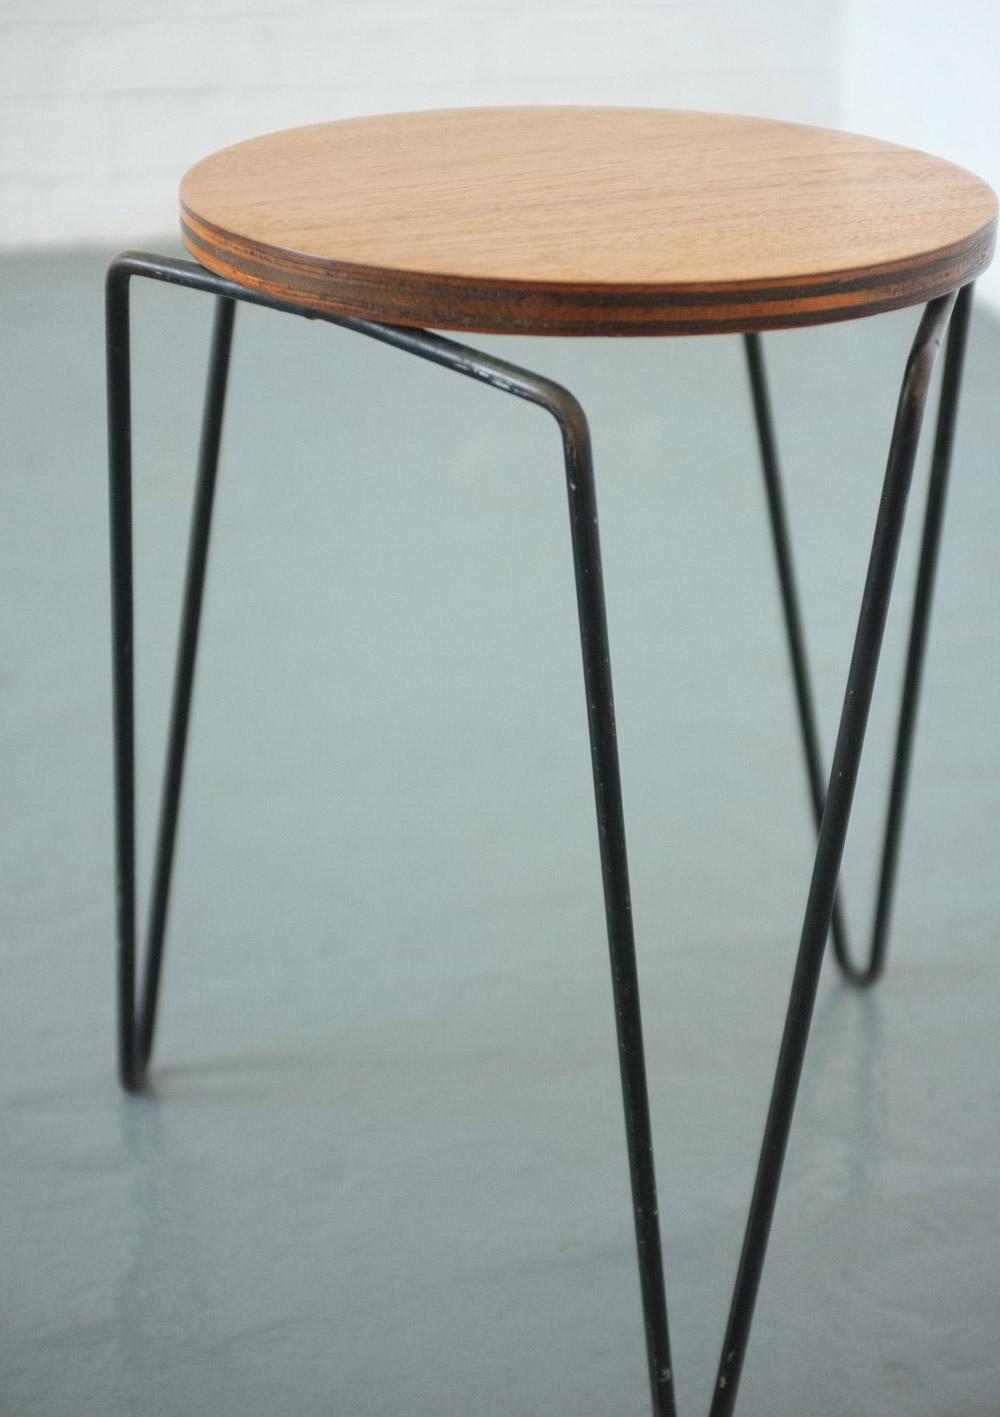 Florence knoll 75 stool table modern room 20th century for Table cuisine 75 x 75